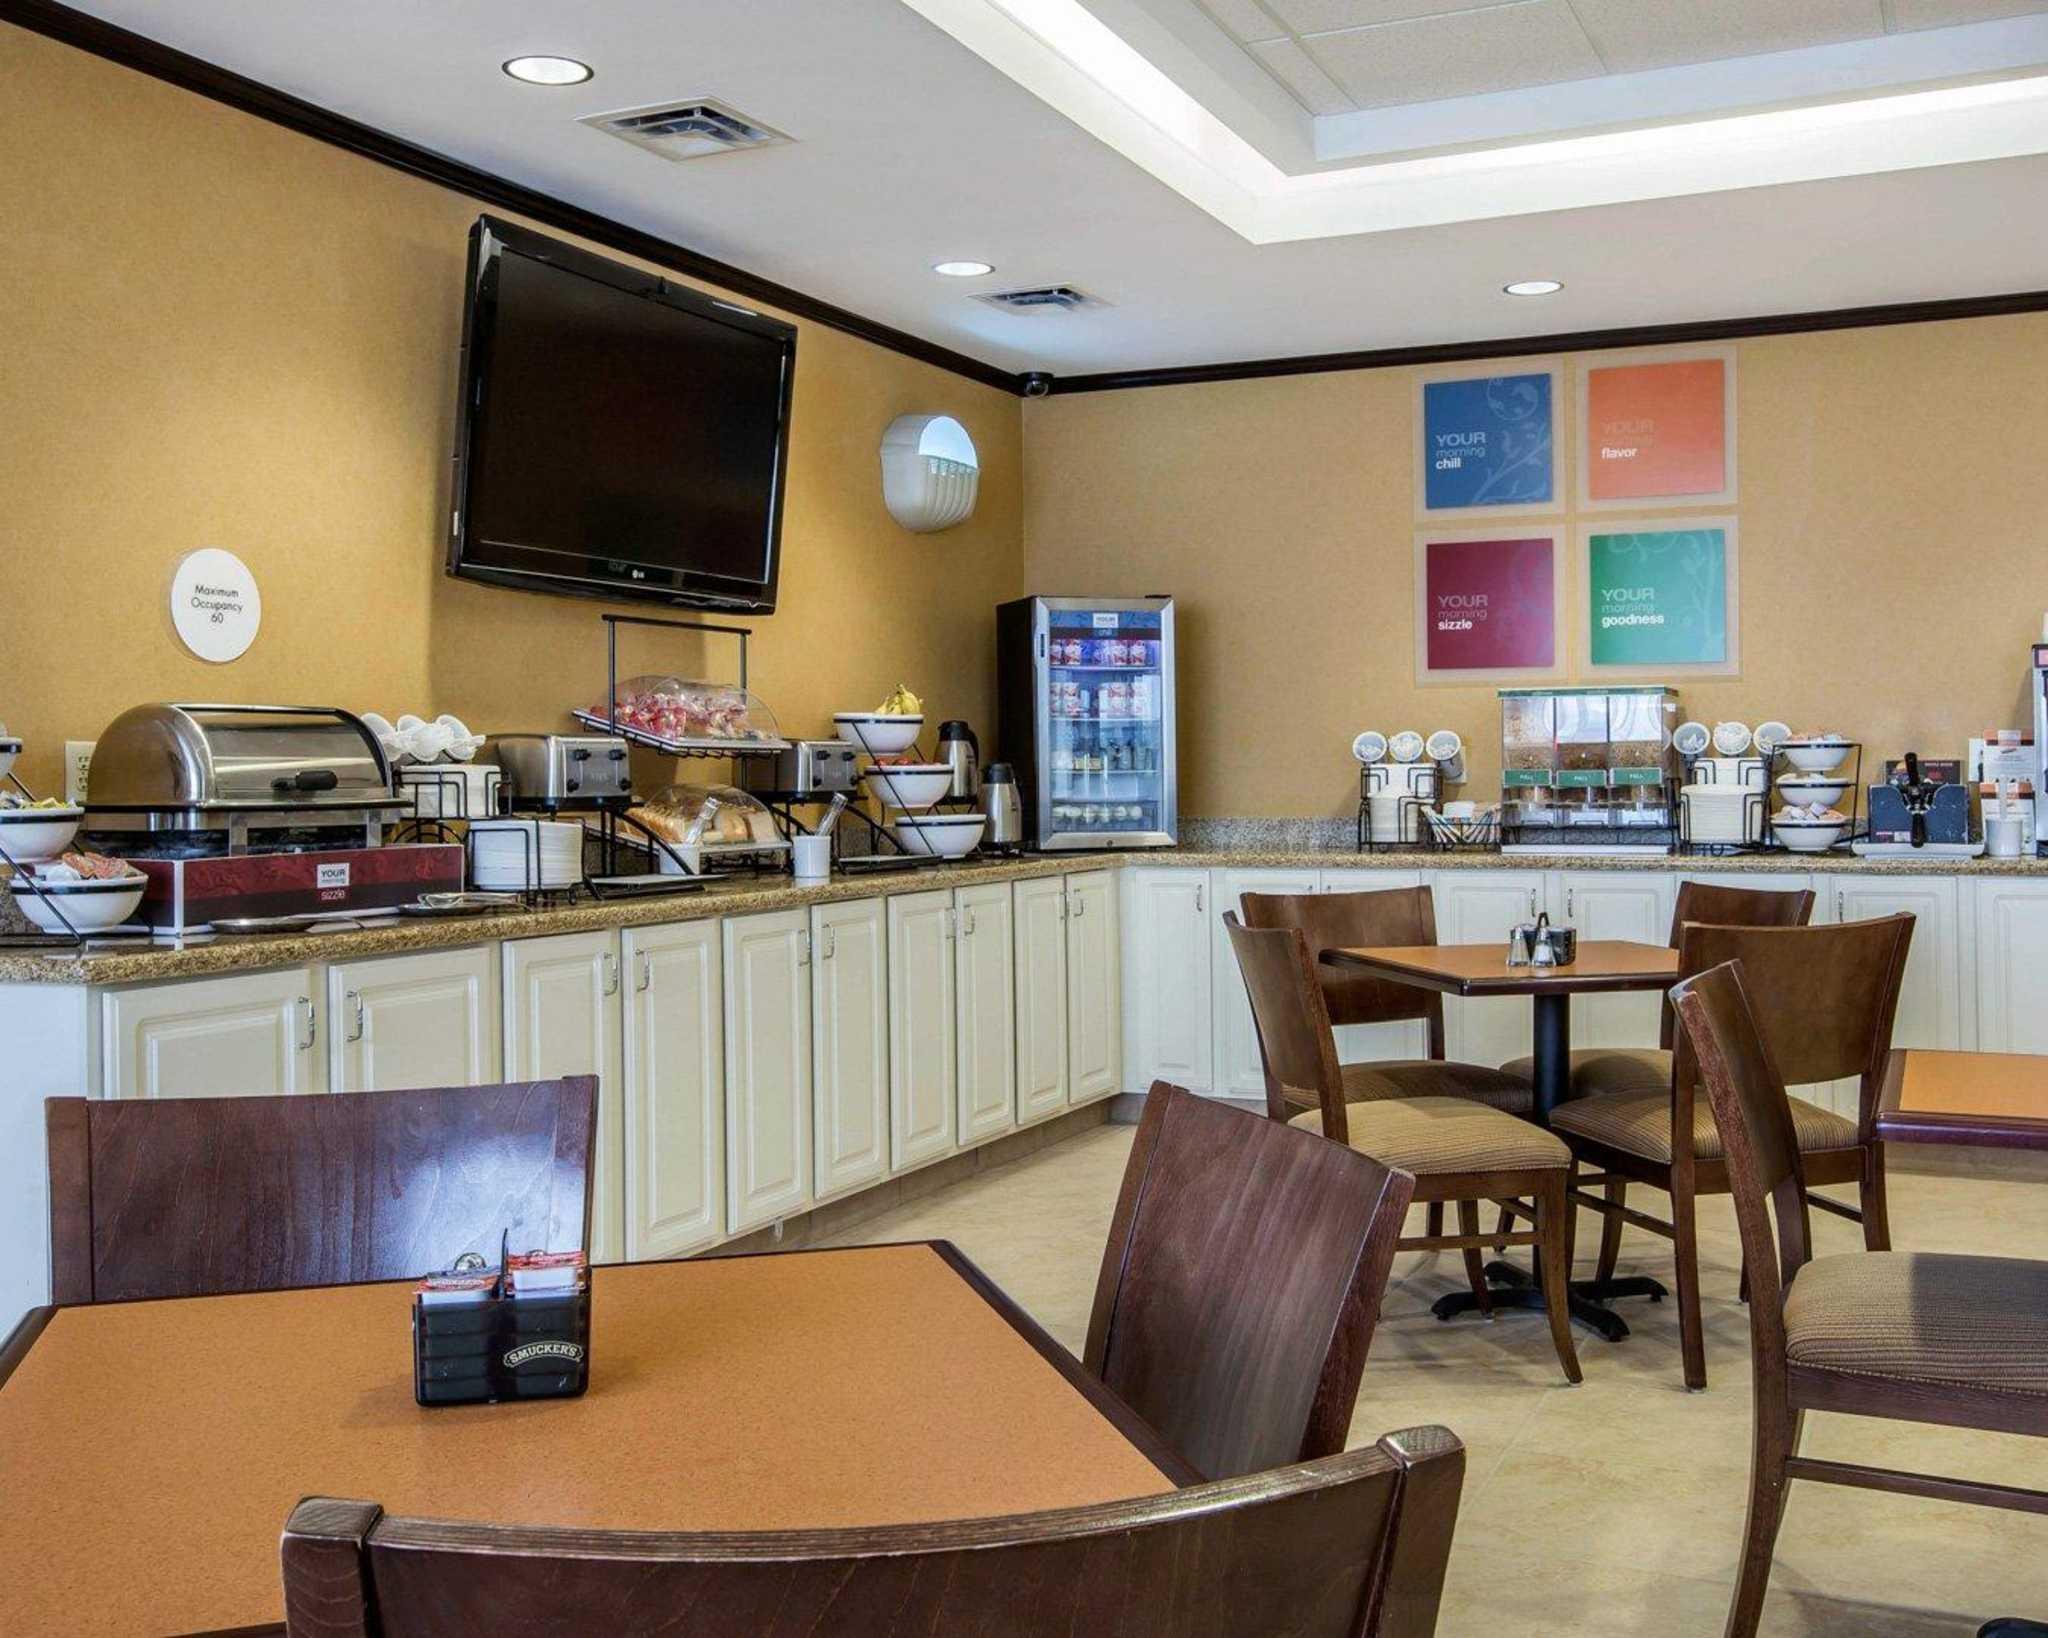 Comfort Inn & Suites adj to Akwesasne Mohawk Casino image 35